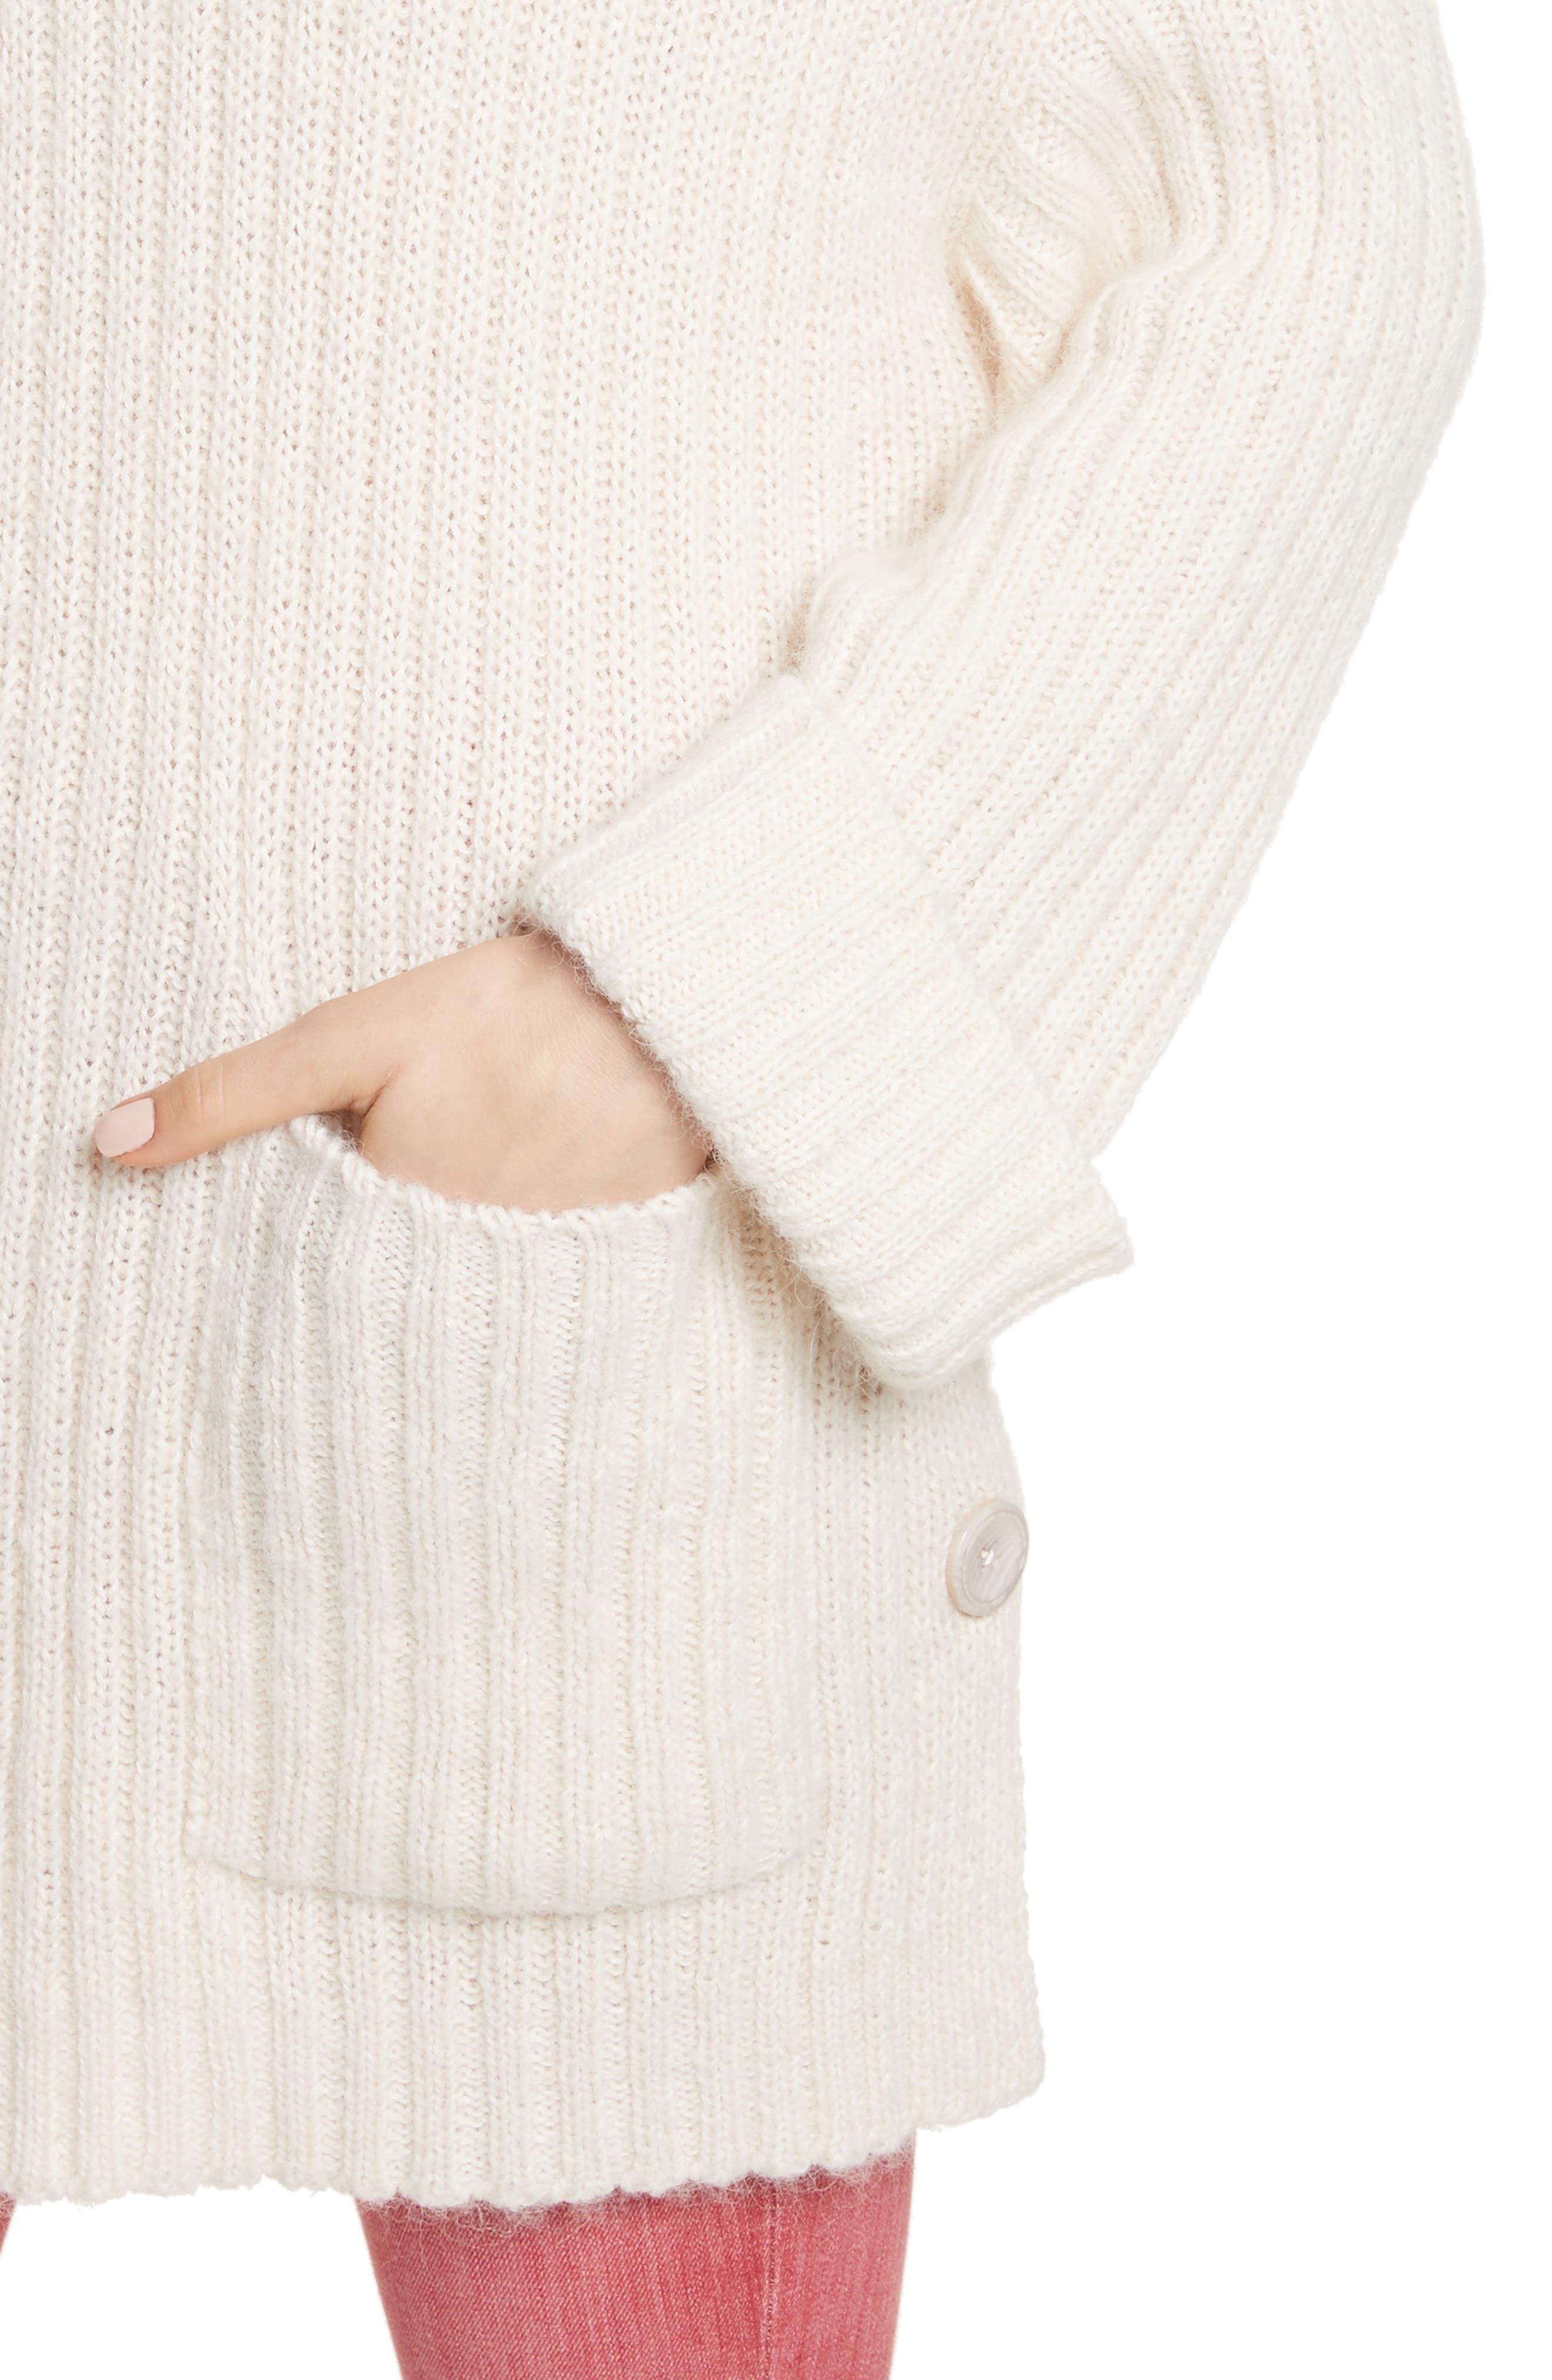 Banain Turtleneck Sweater,                             Alternate thumbnail 4, color,                             114